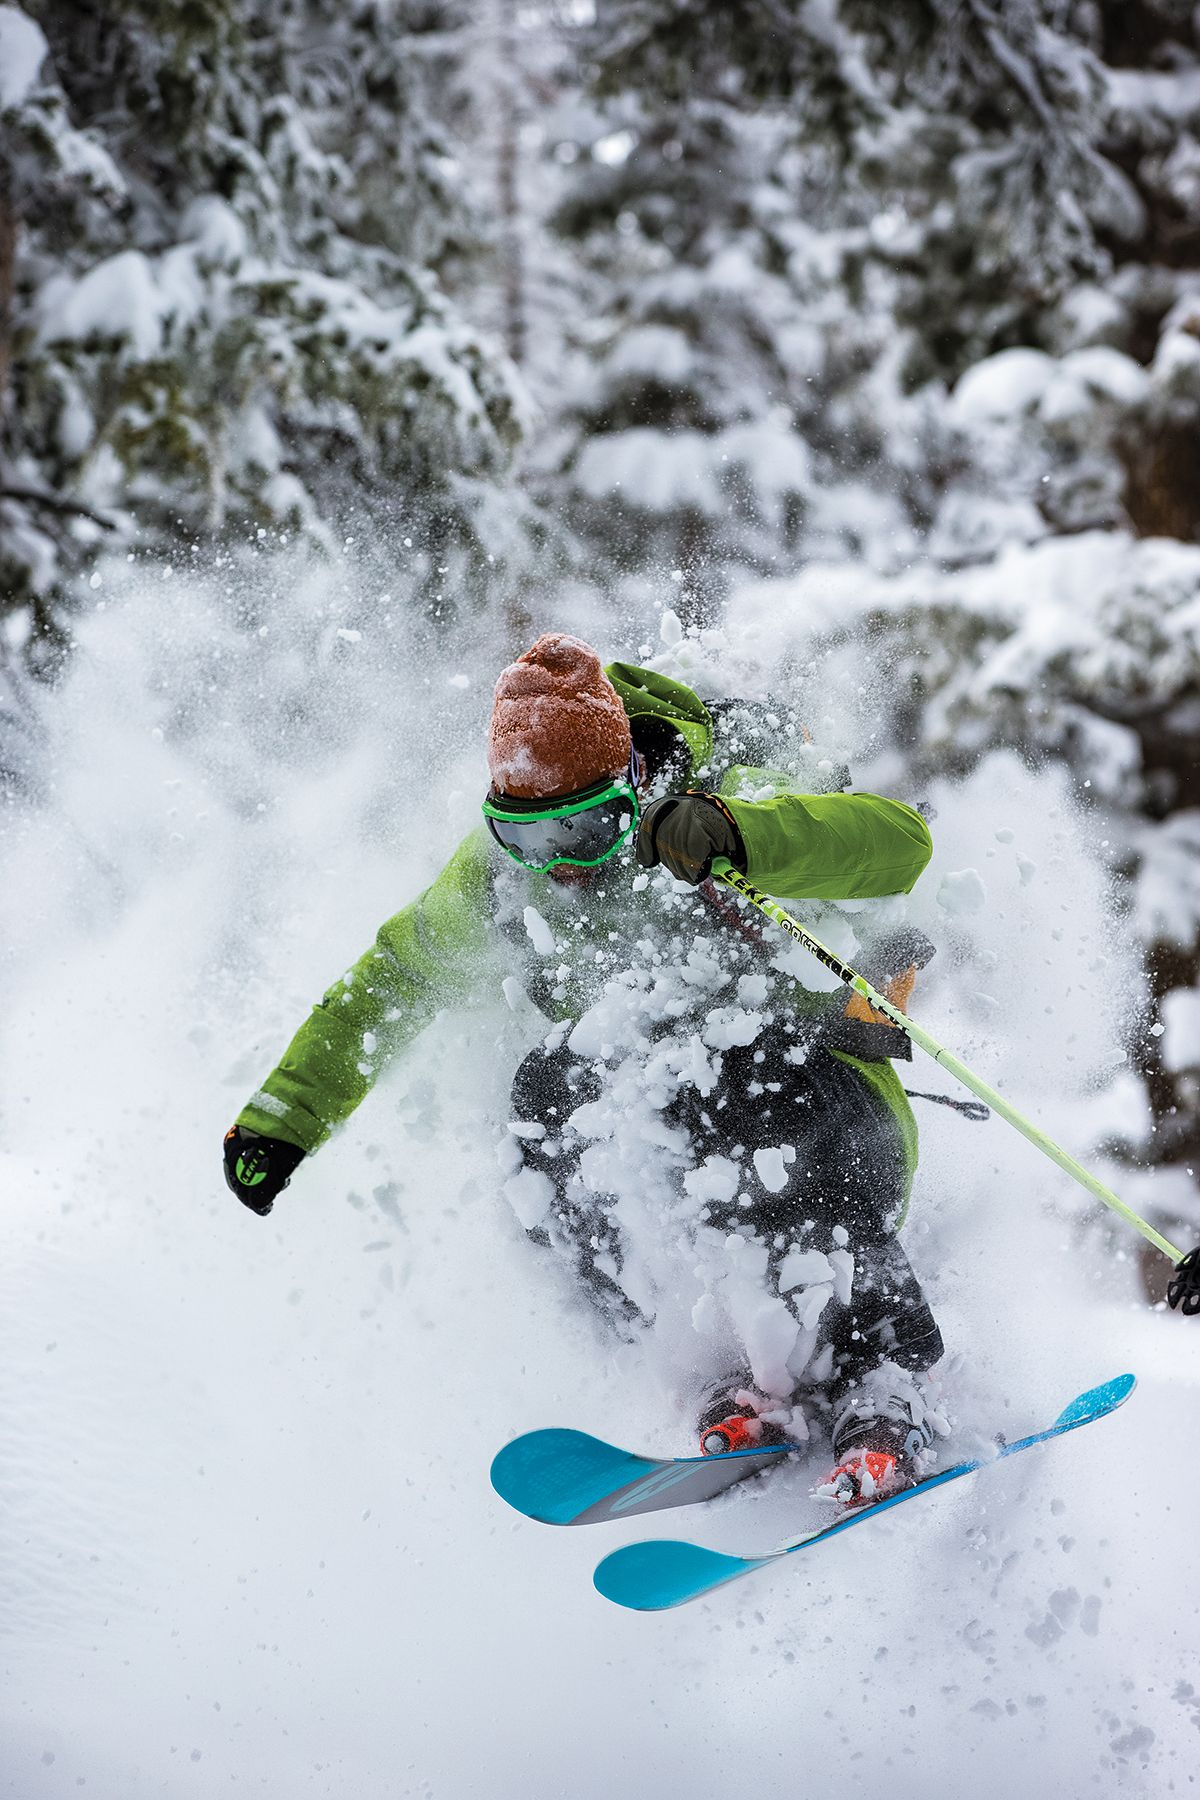 resort guide 2016 best ski resorts in the west, where to ski ski